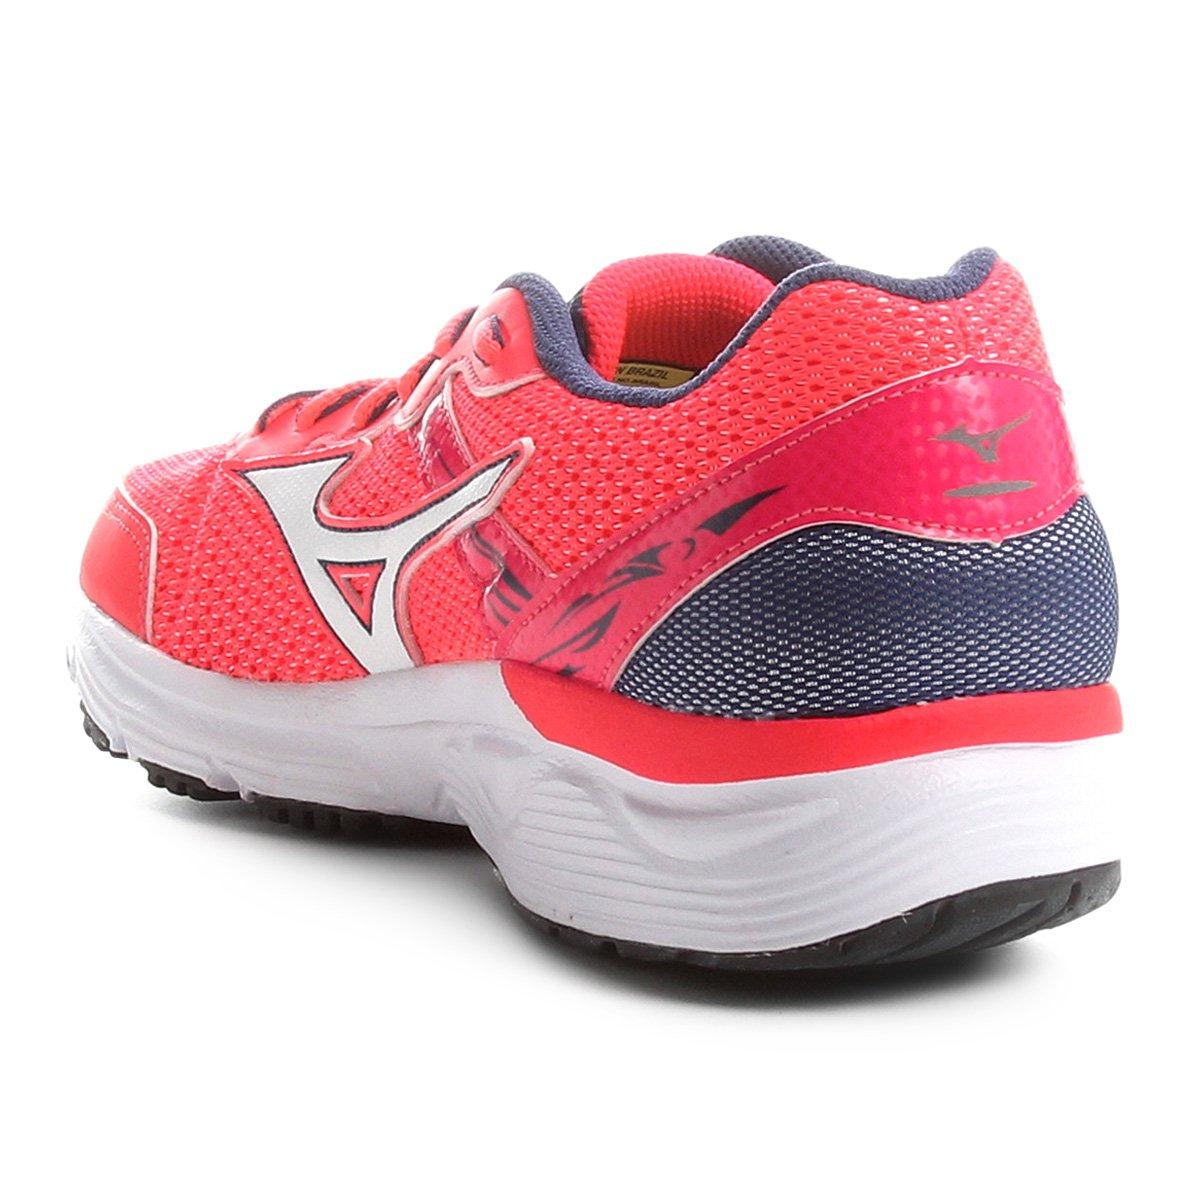 624baad107 Tênis Mizuno Brave N Feminino - Rosa e Violeta - Compre Agora